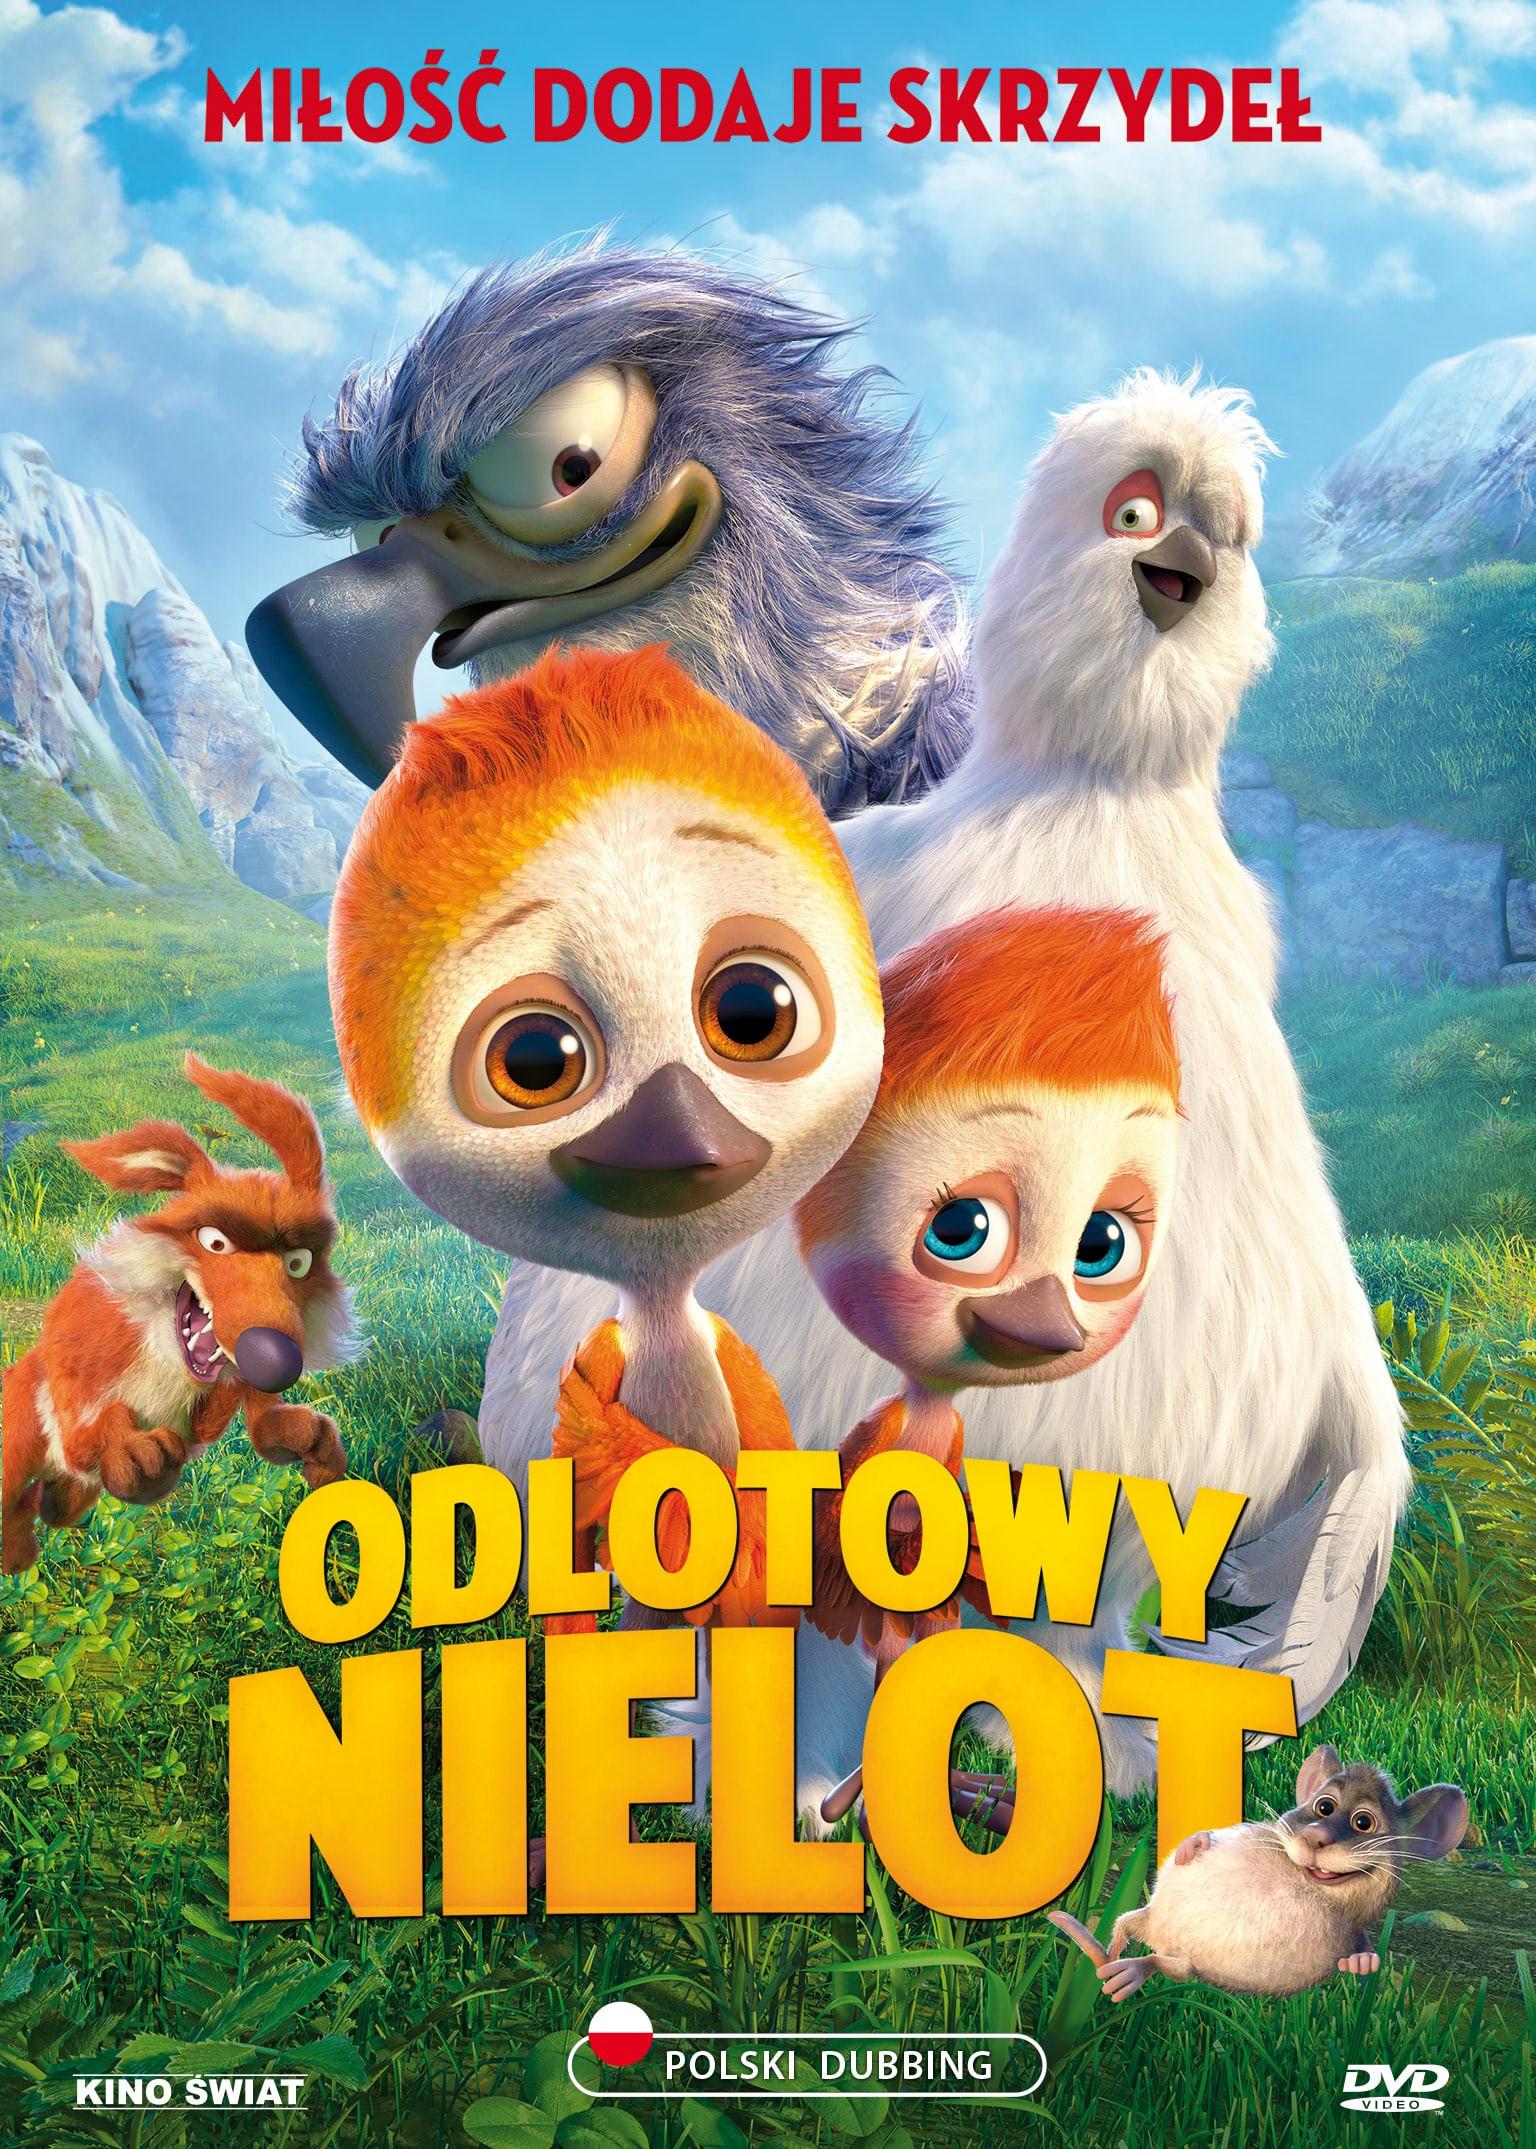 Odlotowy-nielot_(1str-DVD)-min.jpeg